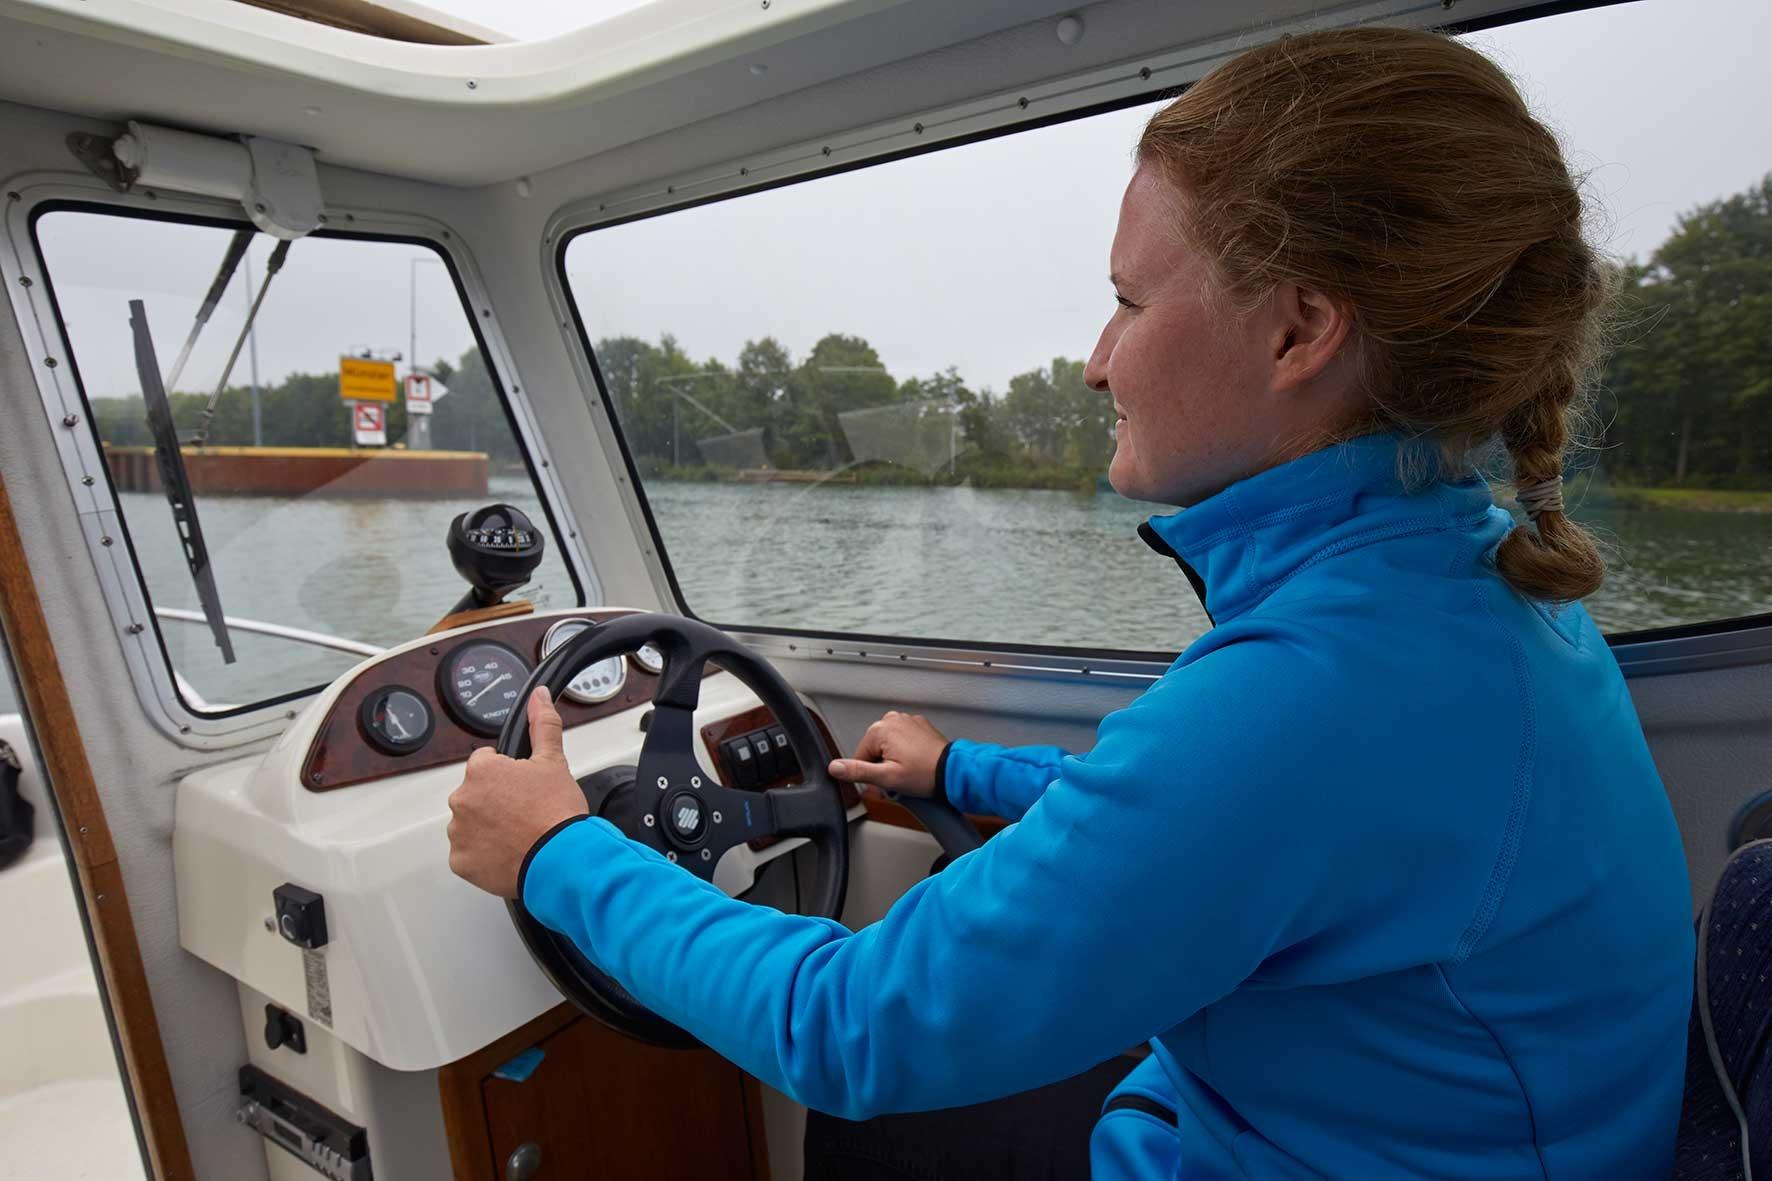 Motorbootsausbildung_Steuerfrau